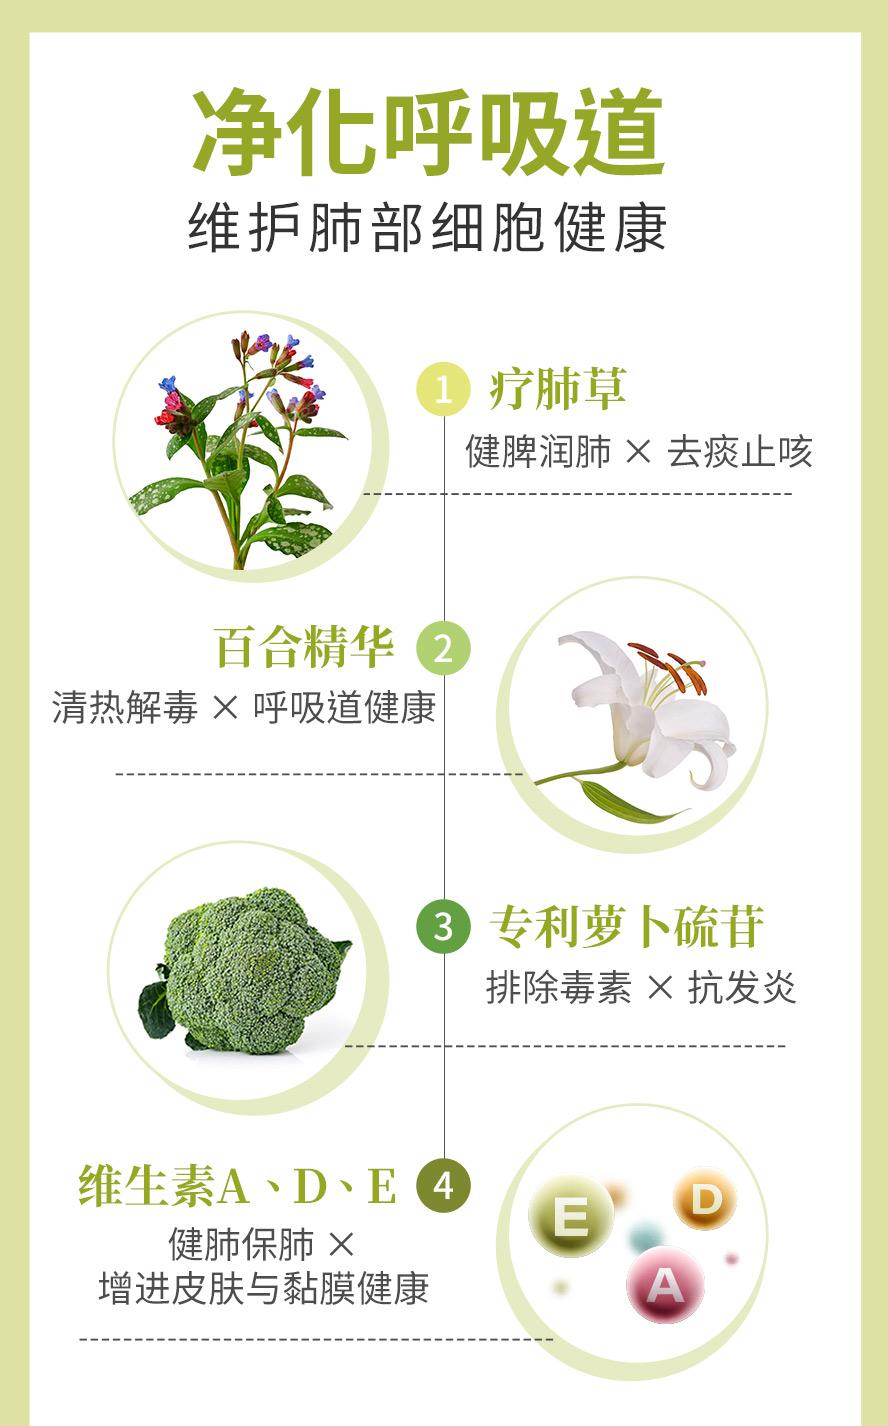 BHK疗肺草采用疗肺草萃取物,百合浓缩粉,专利萝卜硫苷以及维生素A,D,E,让体内空气清新.